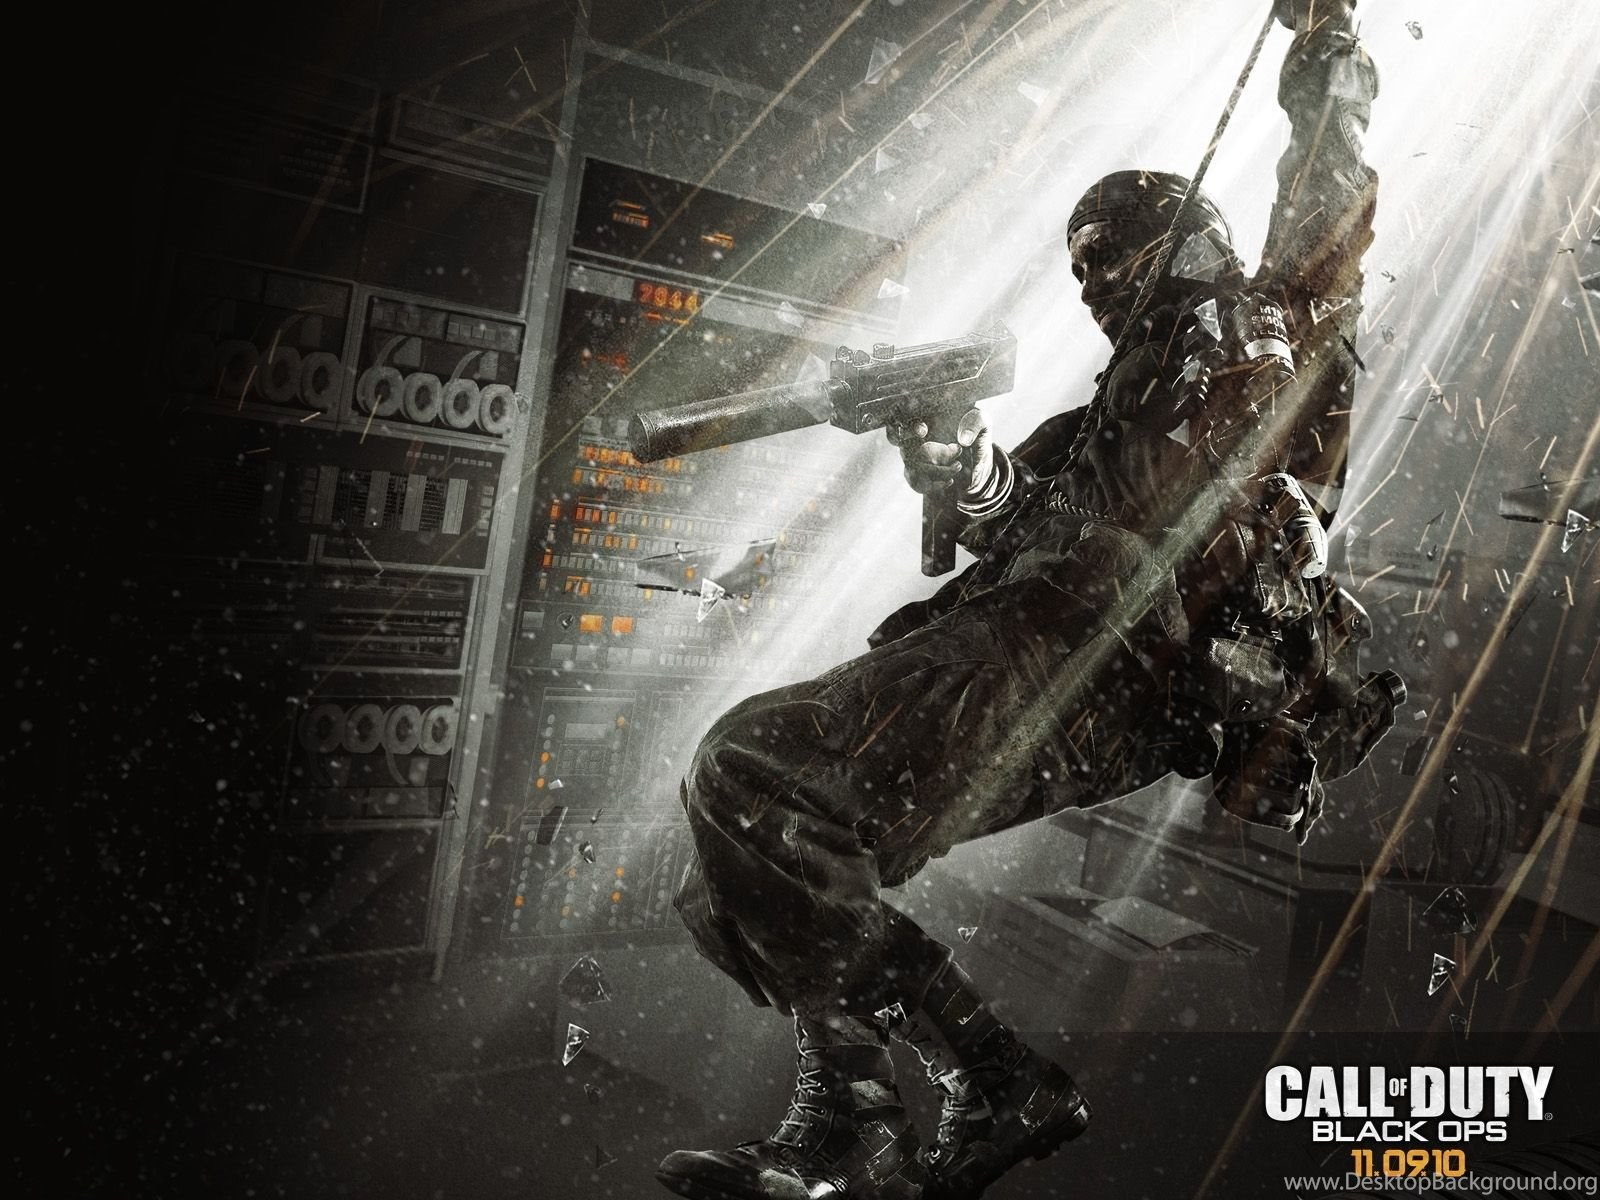 353912 black ops zombies wallpaperhd zombie wallpapers cod black ops